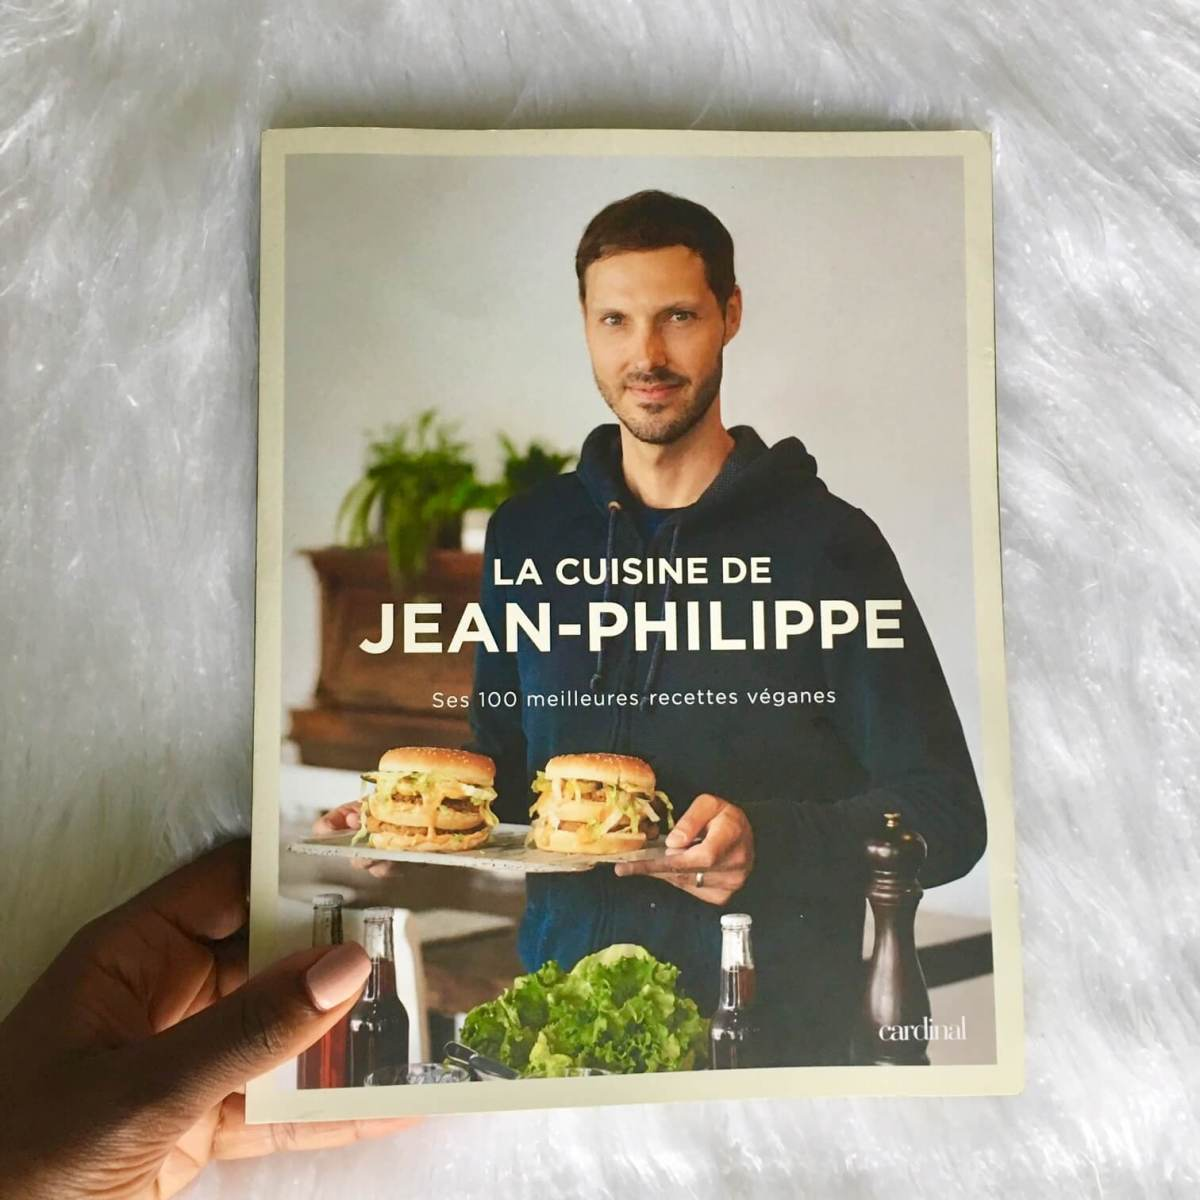 La Cuisine de Jean-Philippe - 100 Vegan Recipes